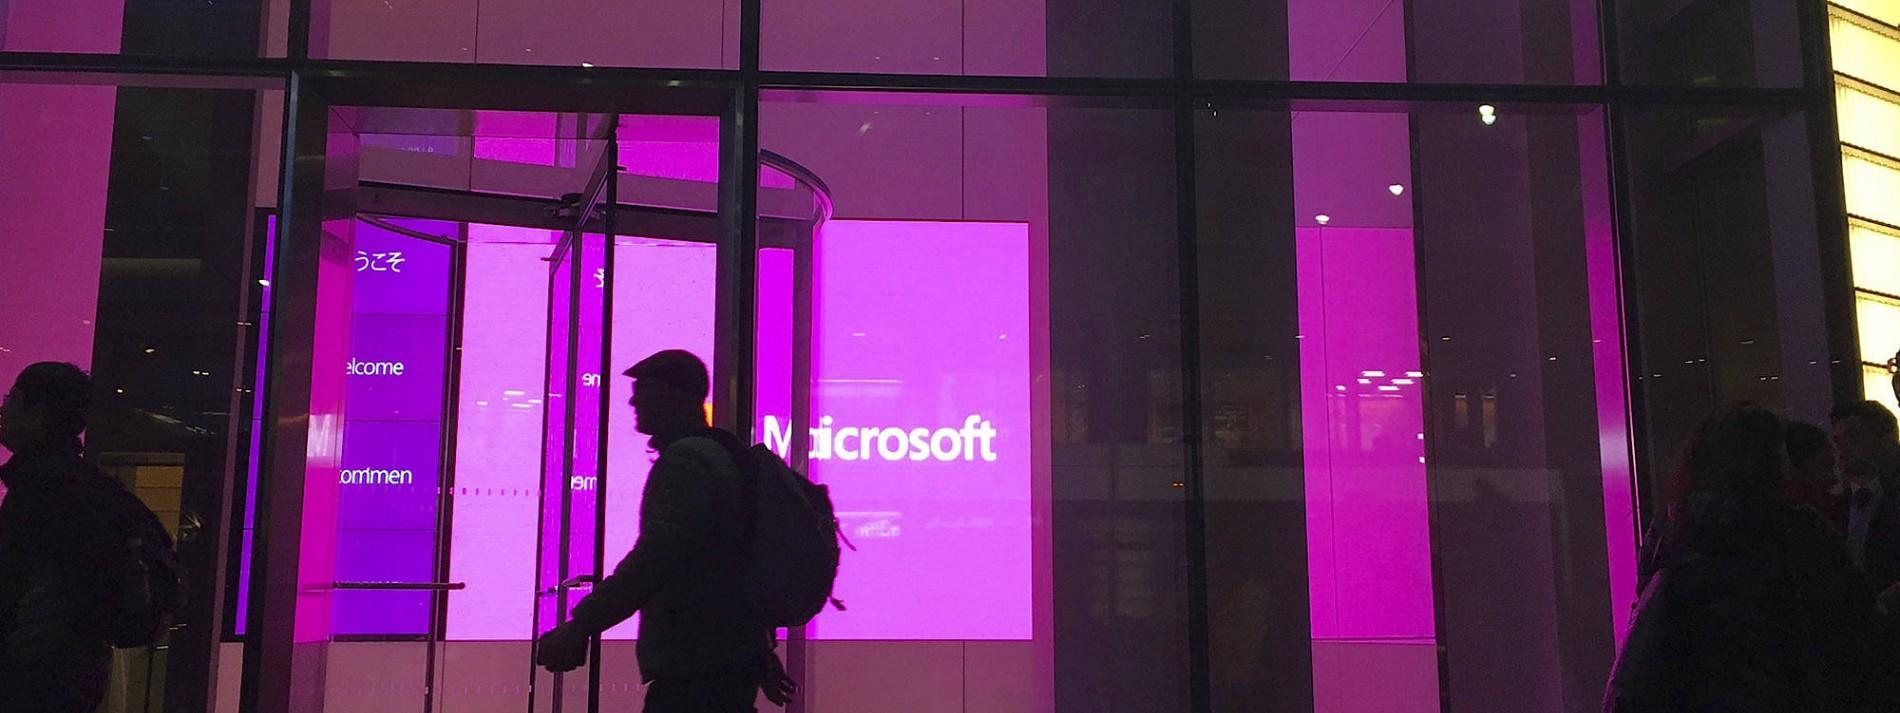 Hacking-Angriff auf Microsoft-Software